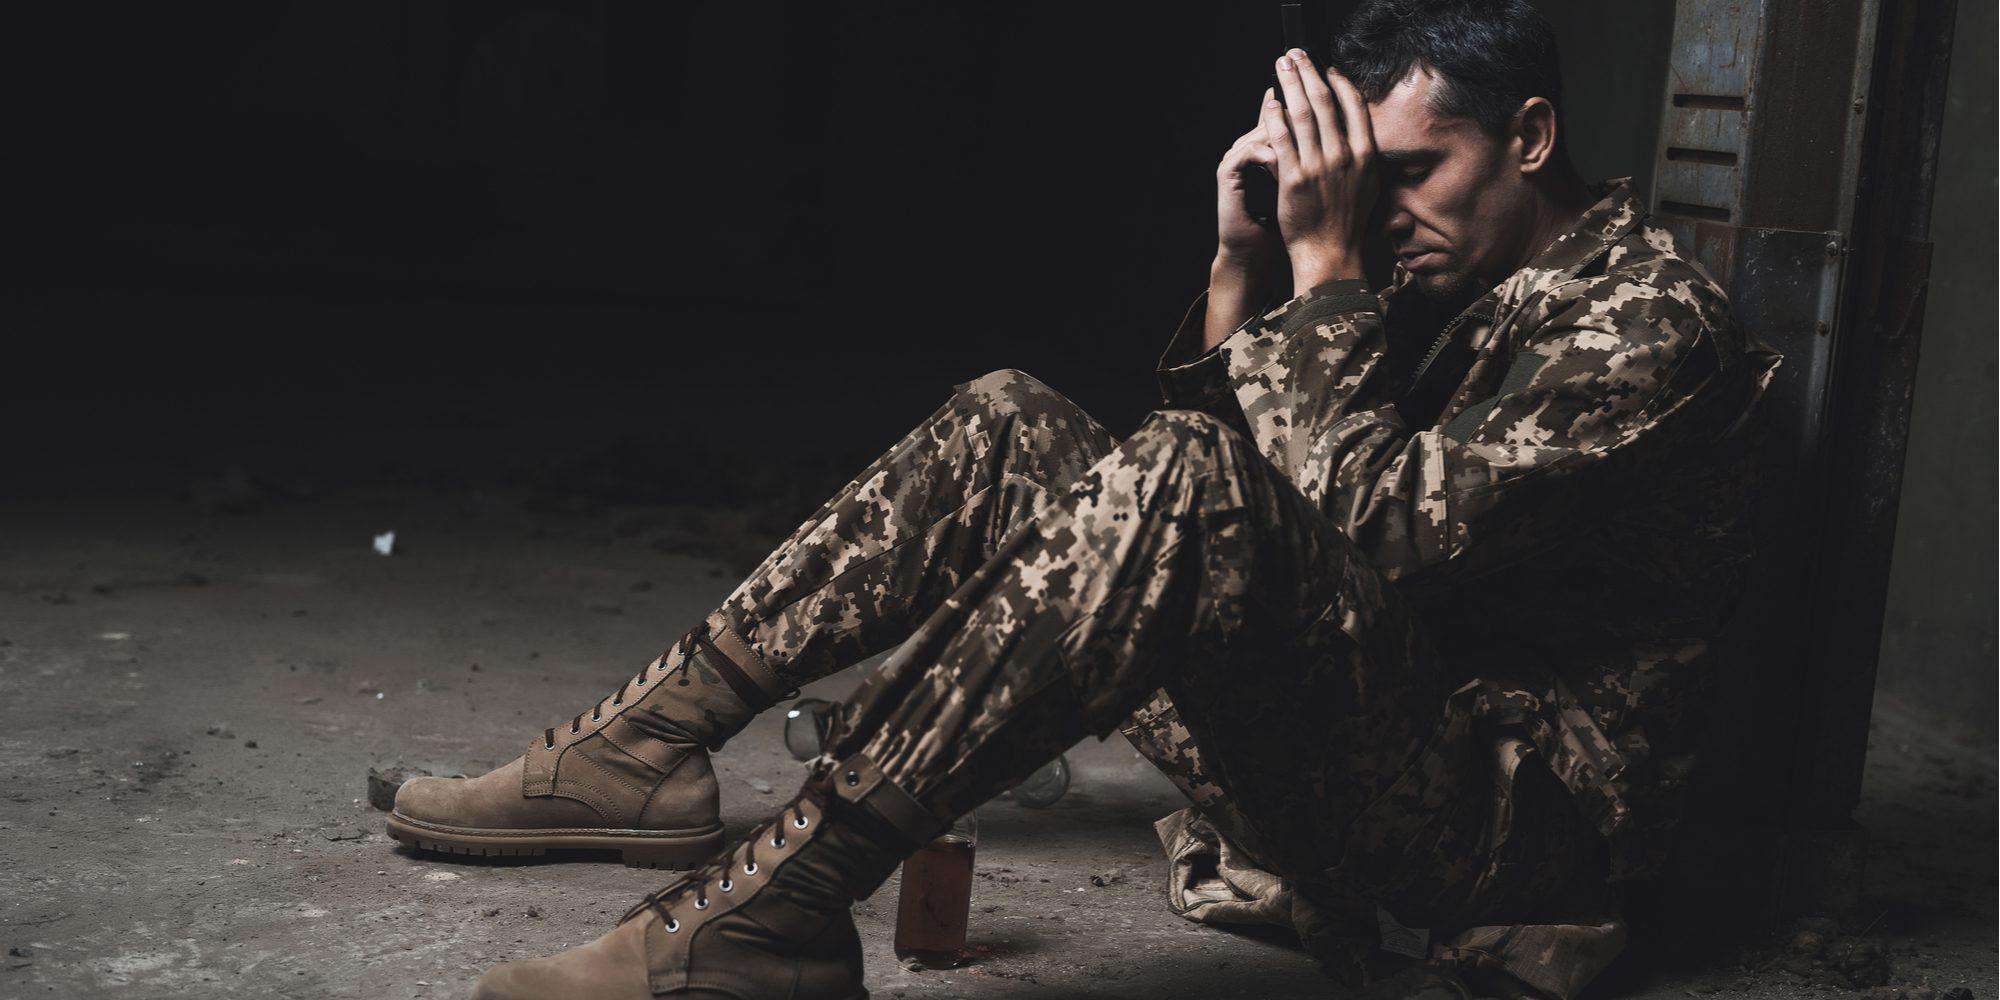 veteran suicide prevention